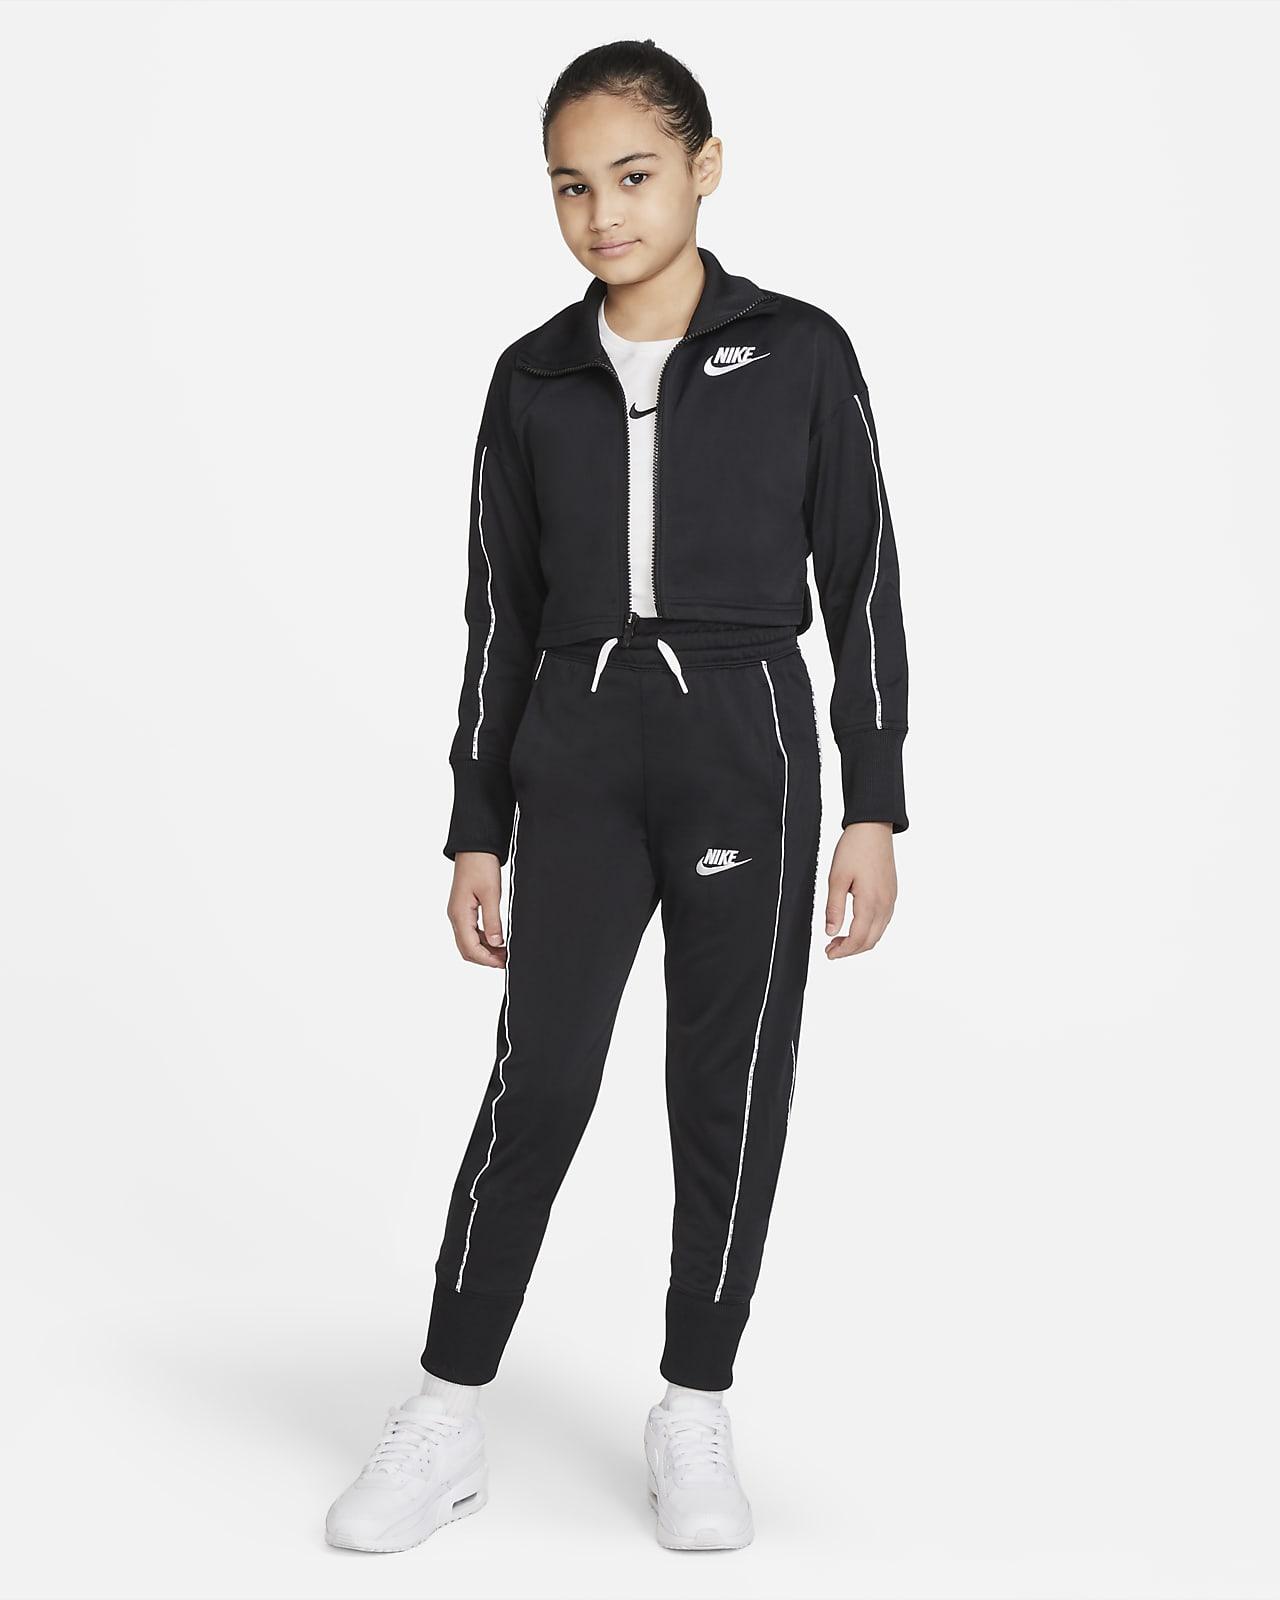 Tuta a vita alta Nike Sportswear - Ragazza